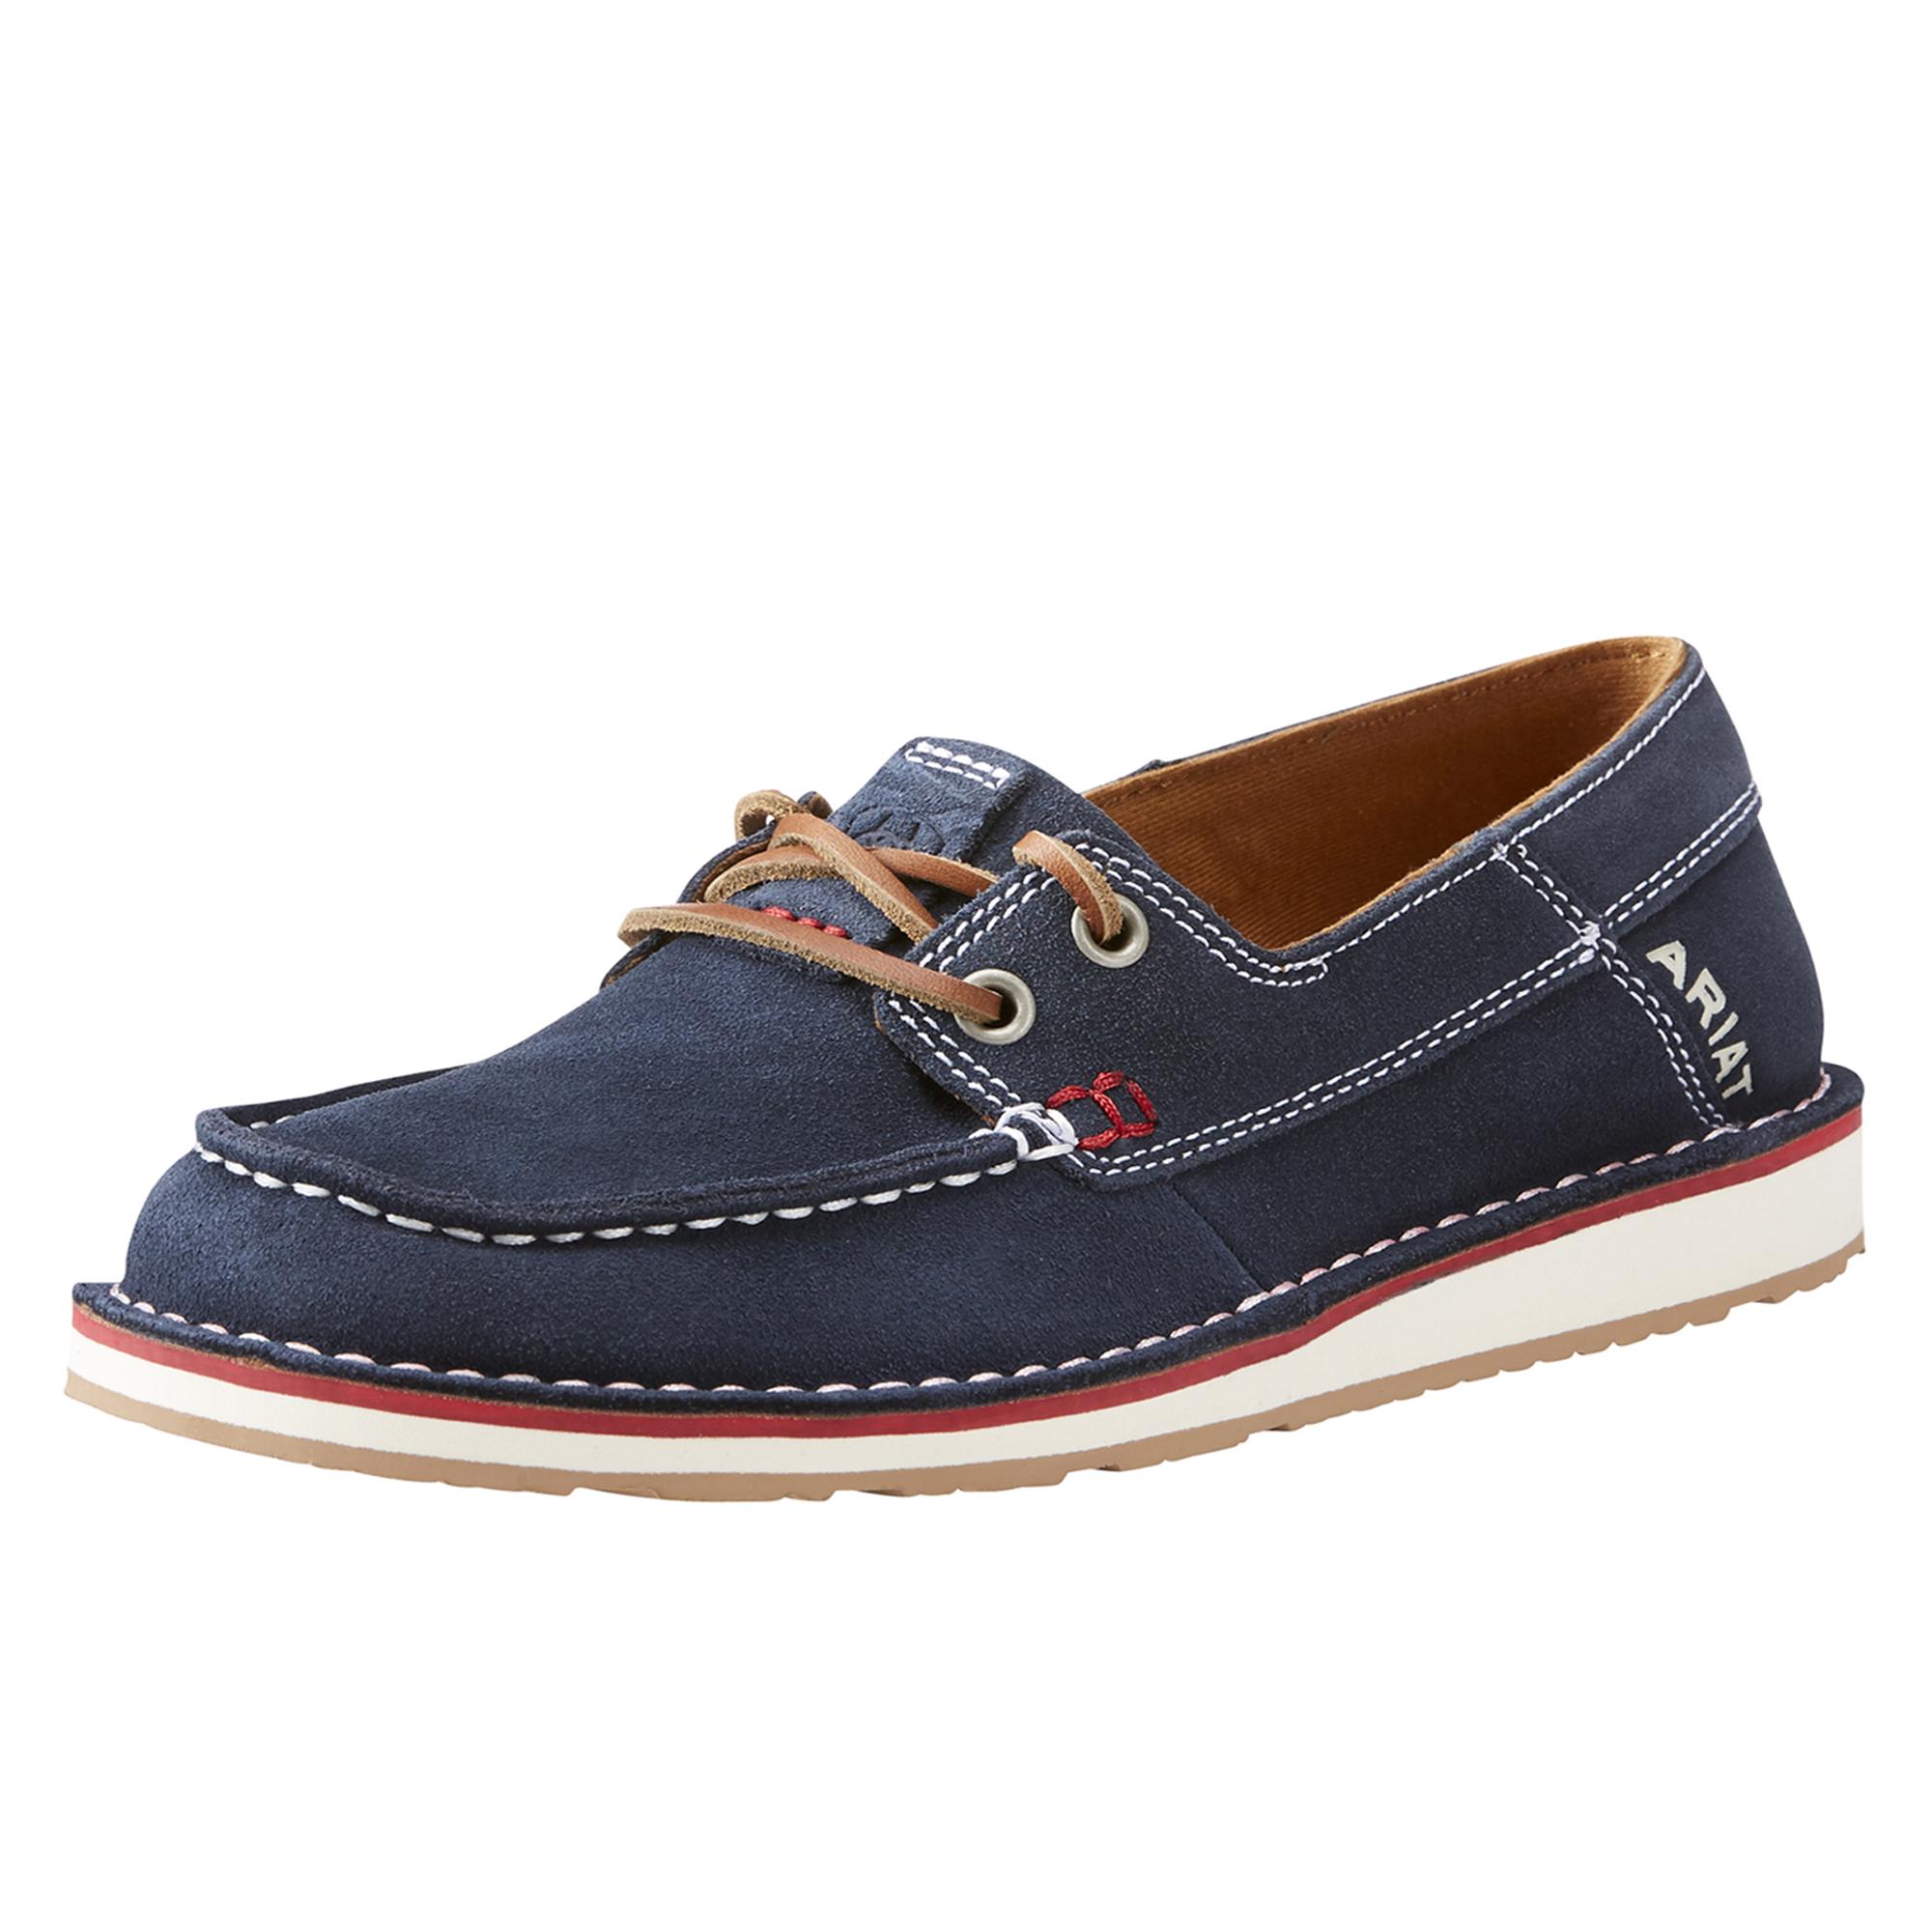 Ariat Castaway Womens Shoes reE94m0